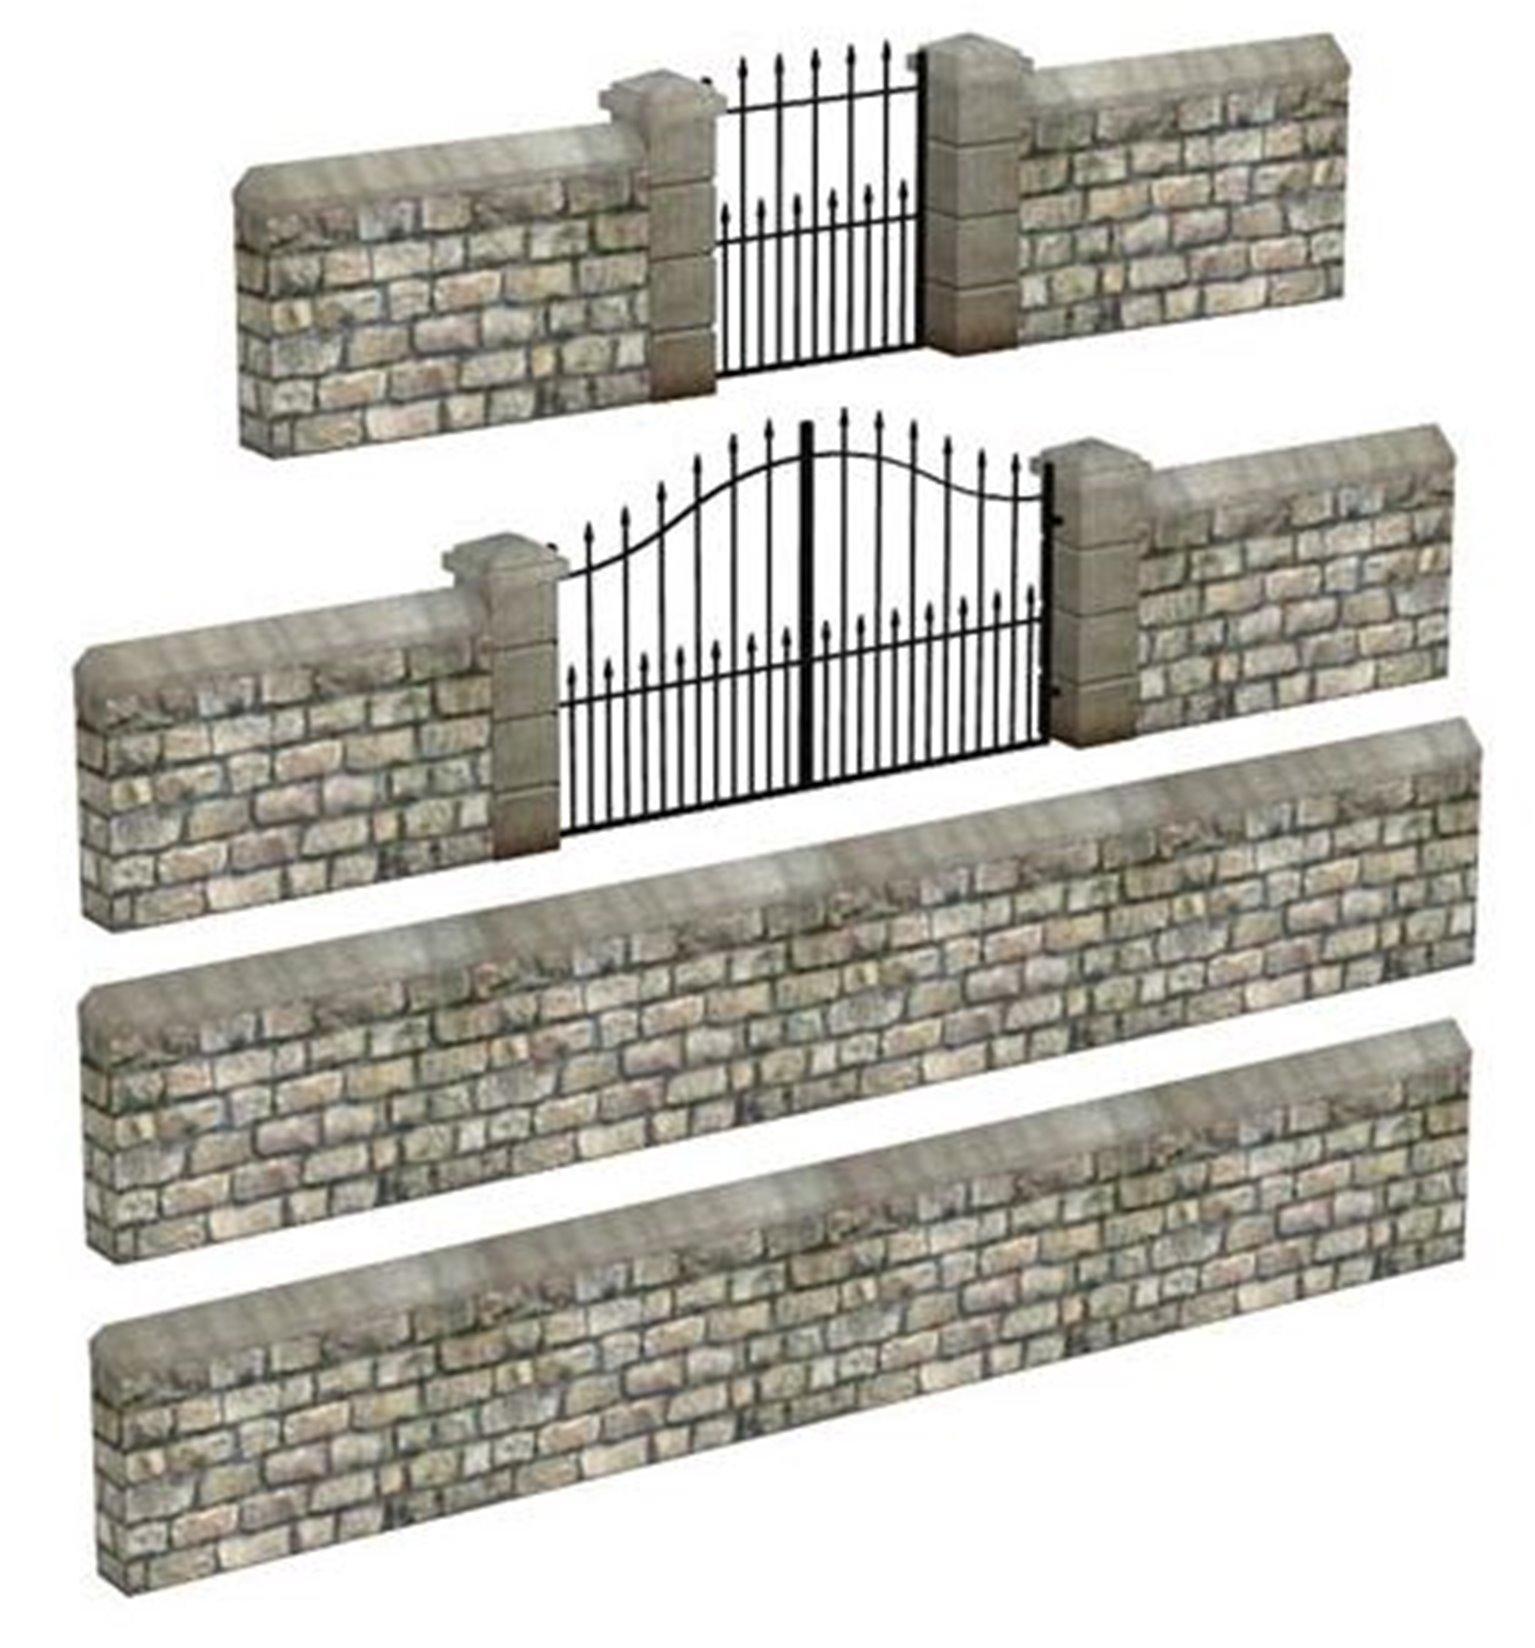 Stone Walls and Gates Various